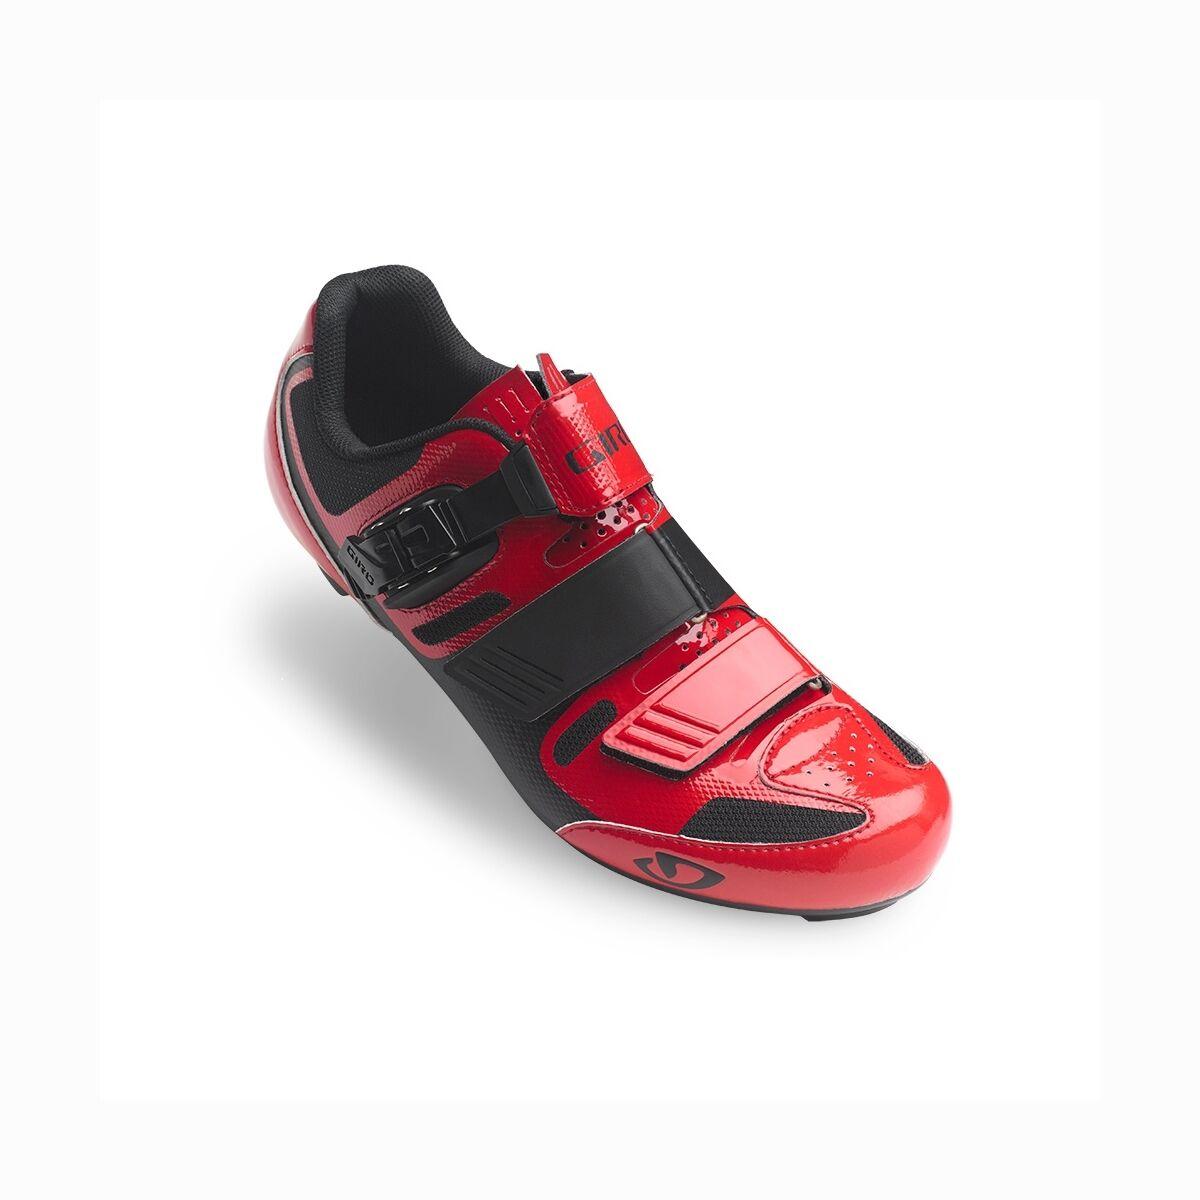 Giro Giro Giro Apeckx II-Cyclisme sur route Chaussures-Rouge vif/Noir acc90e